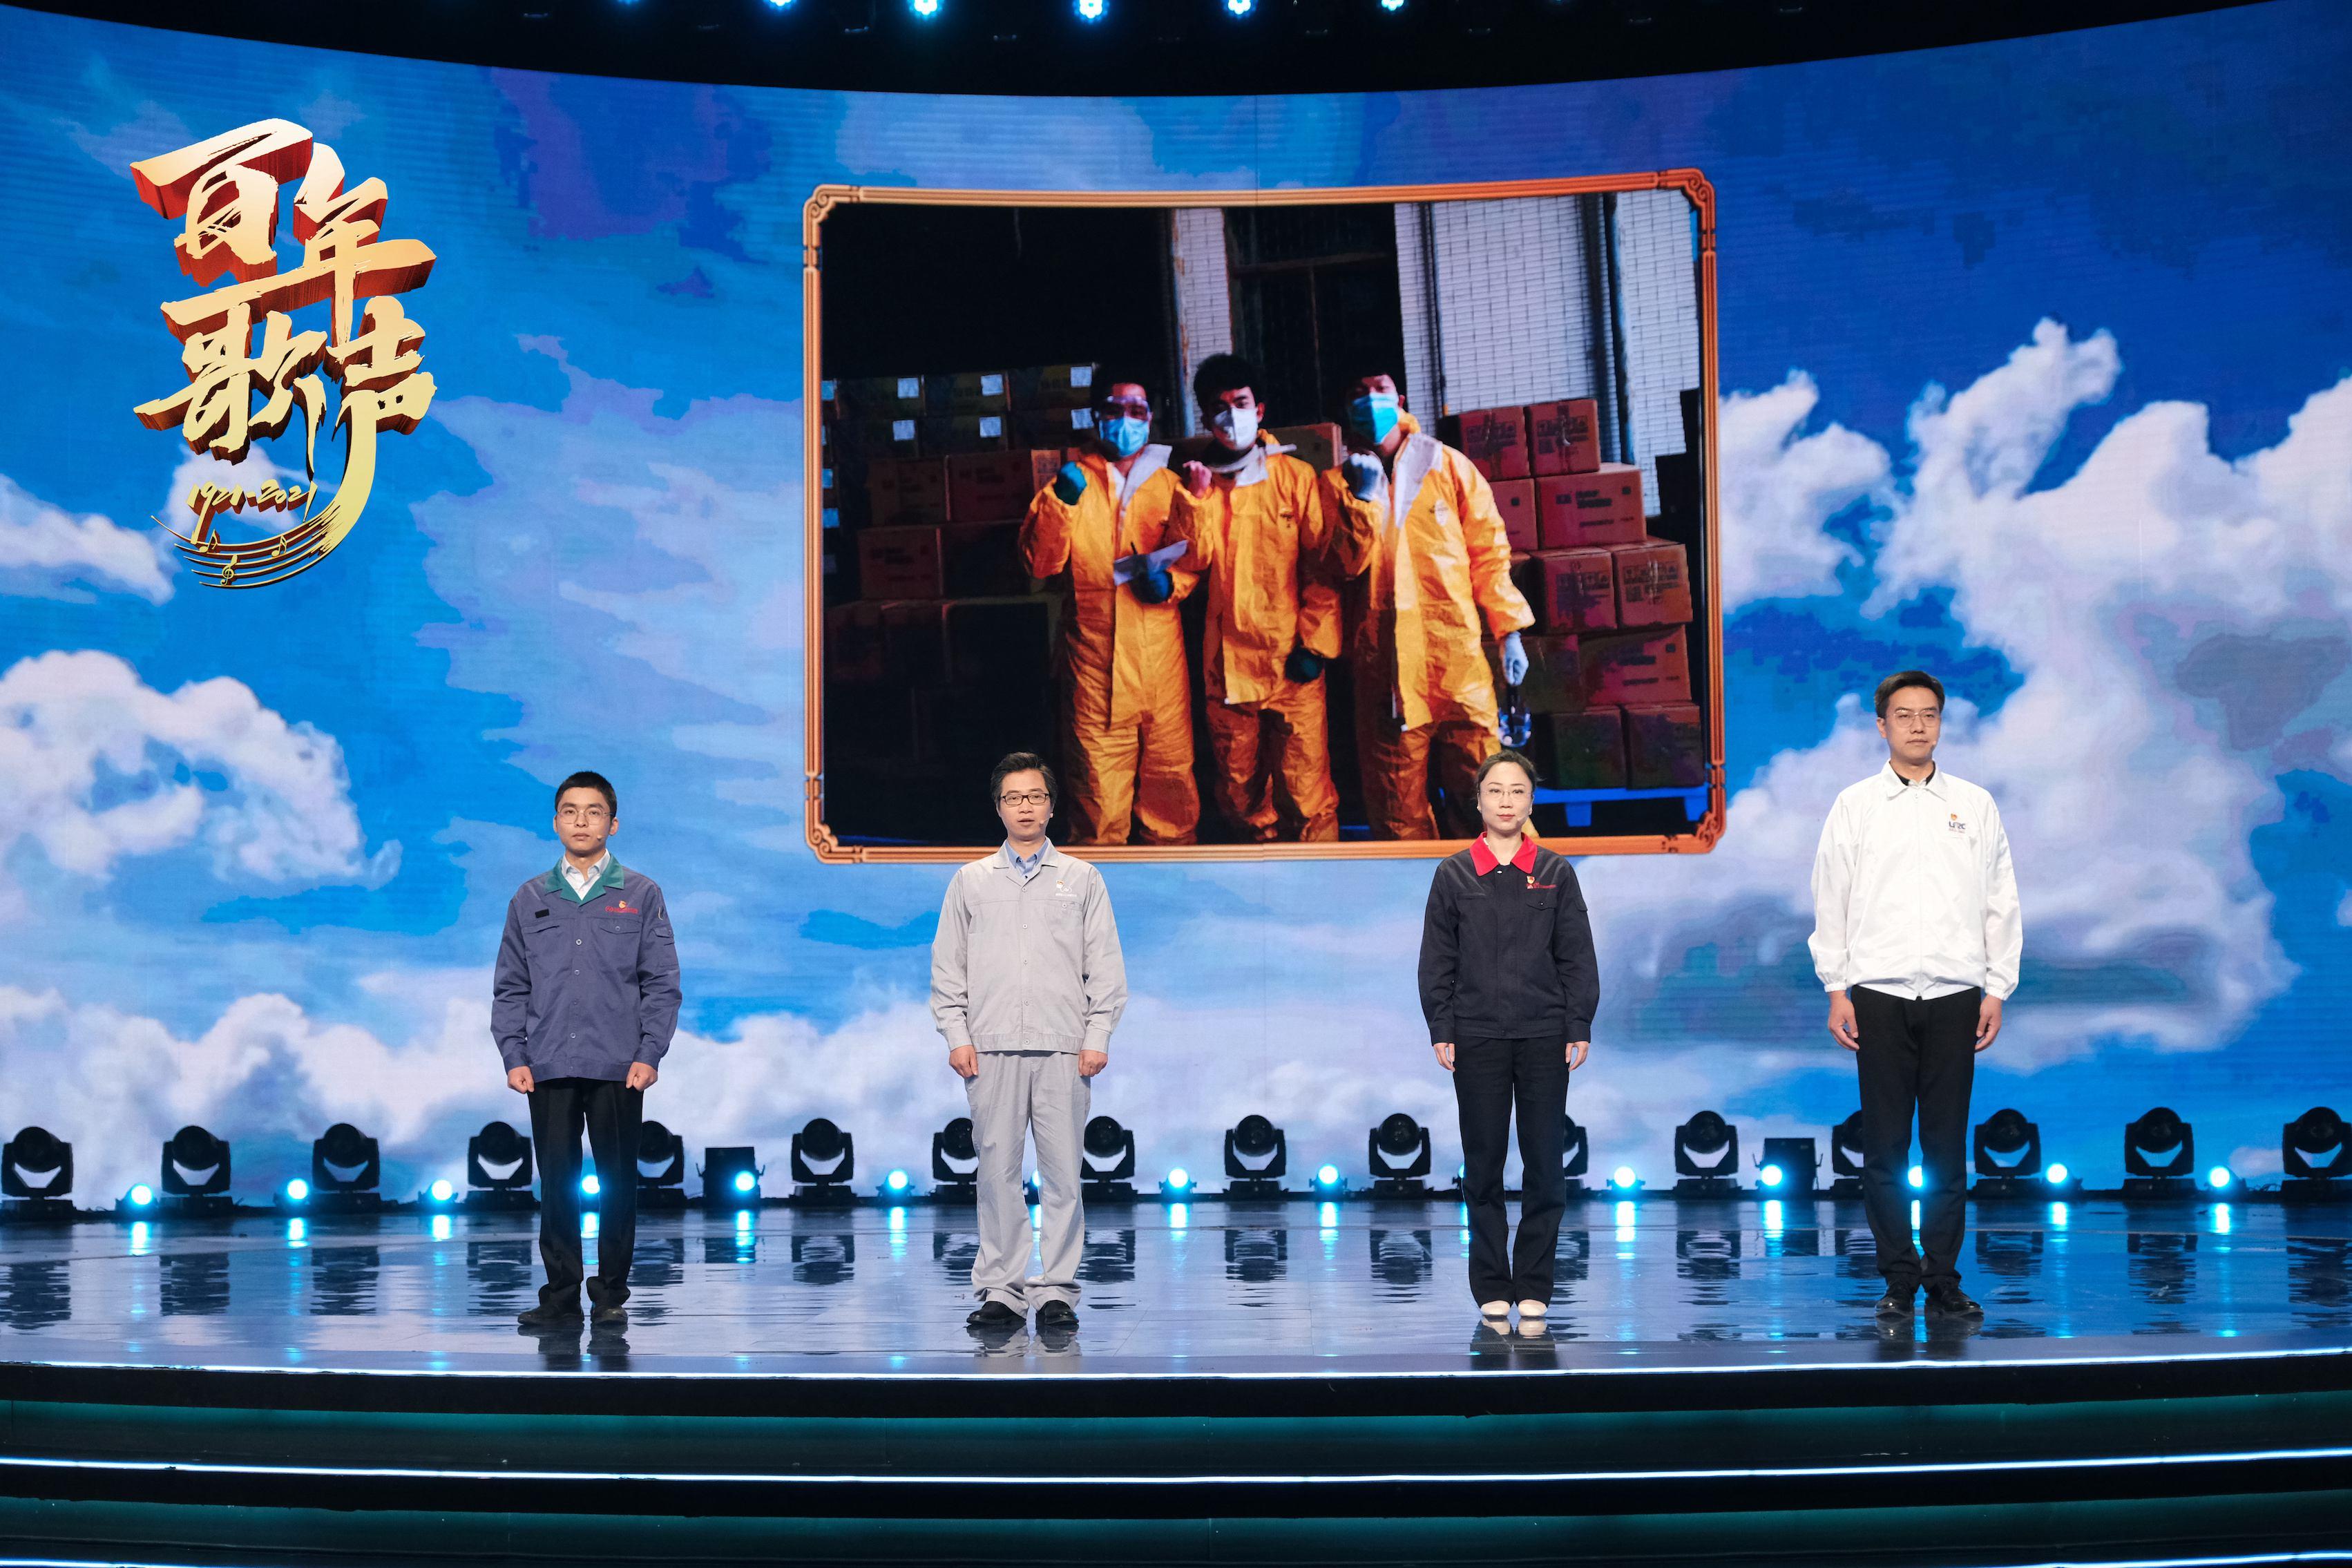 CCTV-3《百年歌声》本周日相见 (2).jpeg